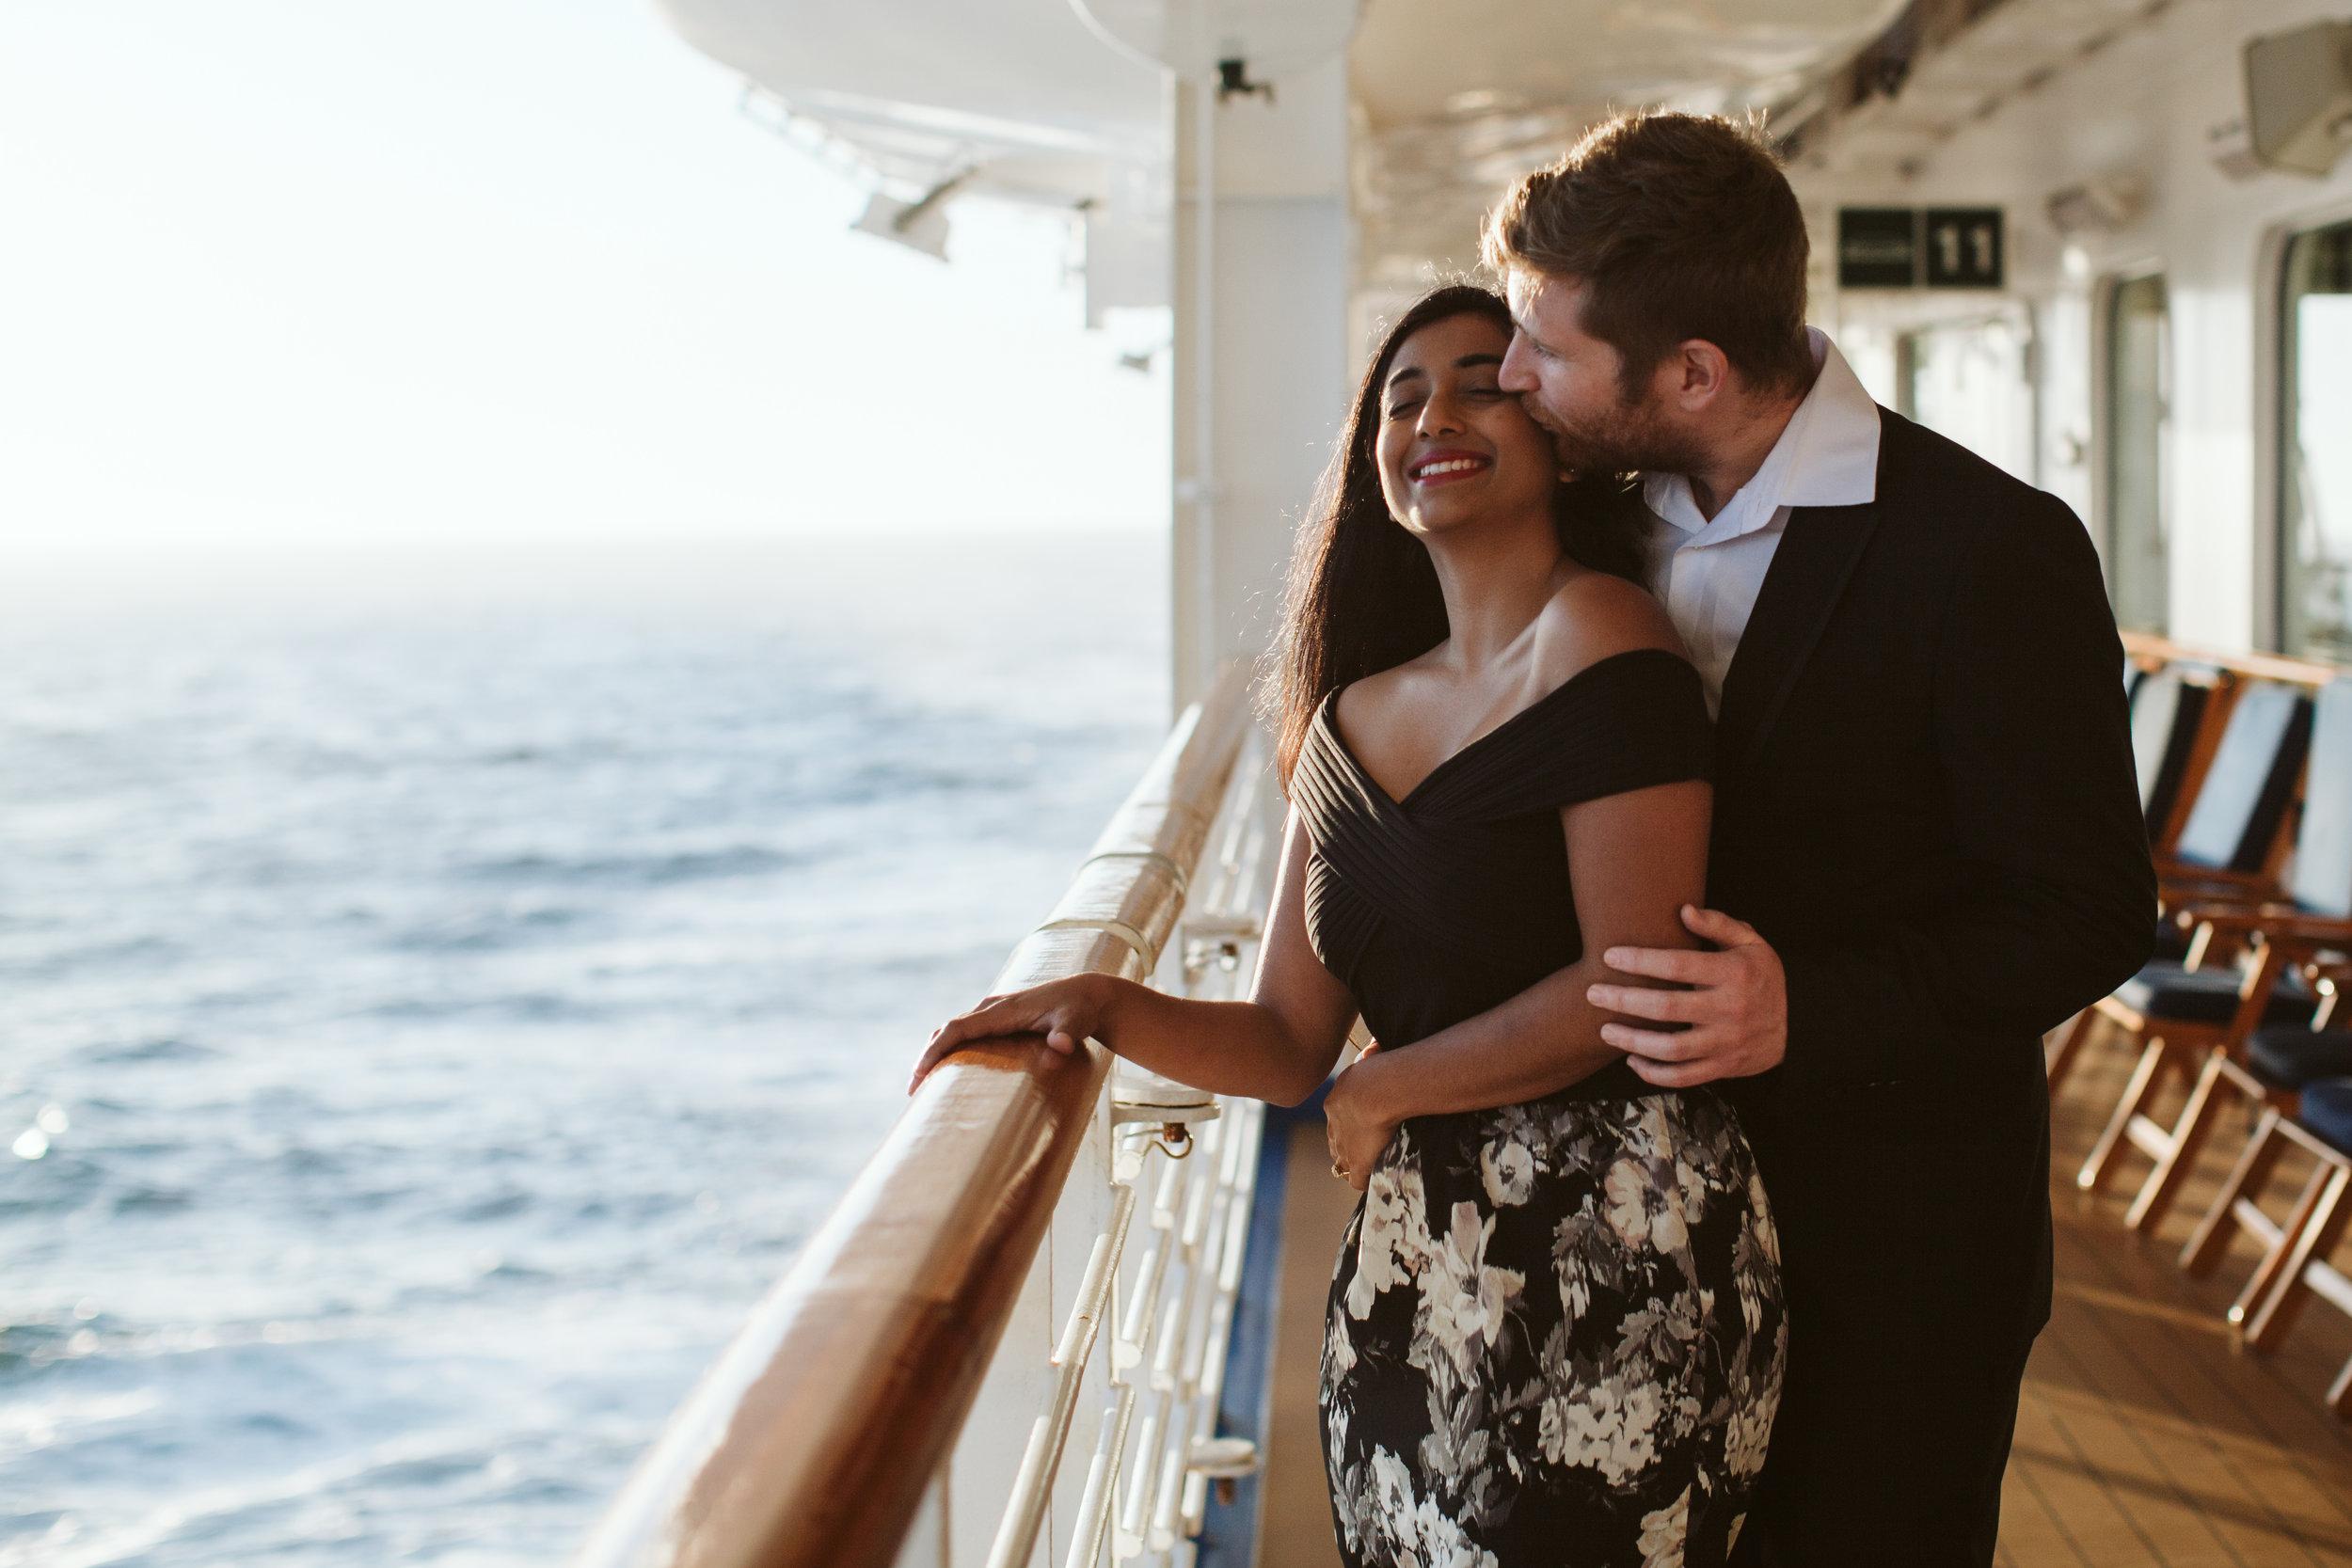 Engagement_Southern Oregon_Cruise_Alaska_Couple (2 of 15).jpg